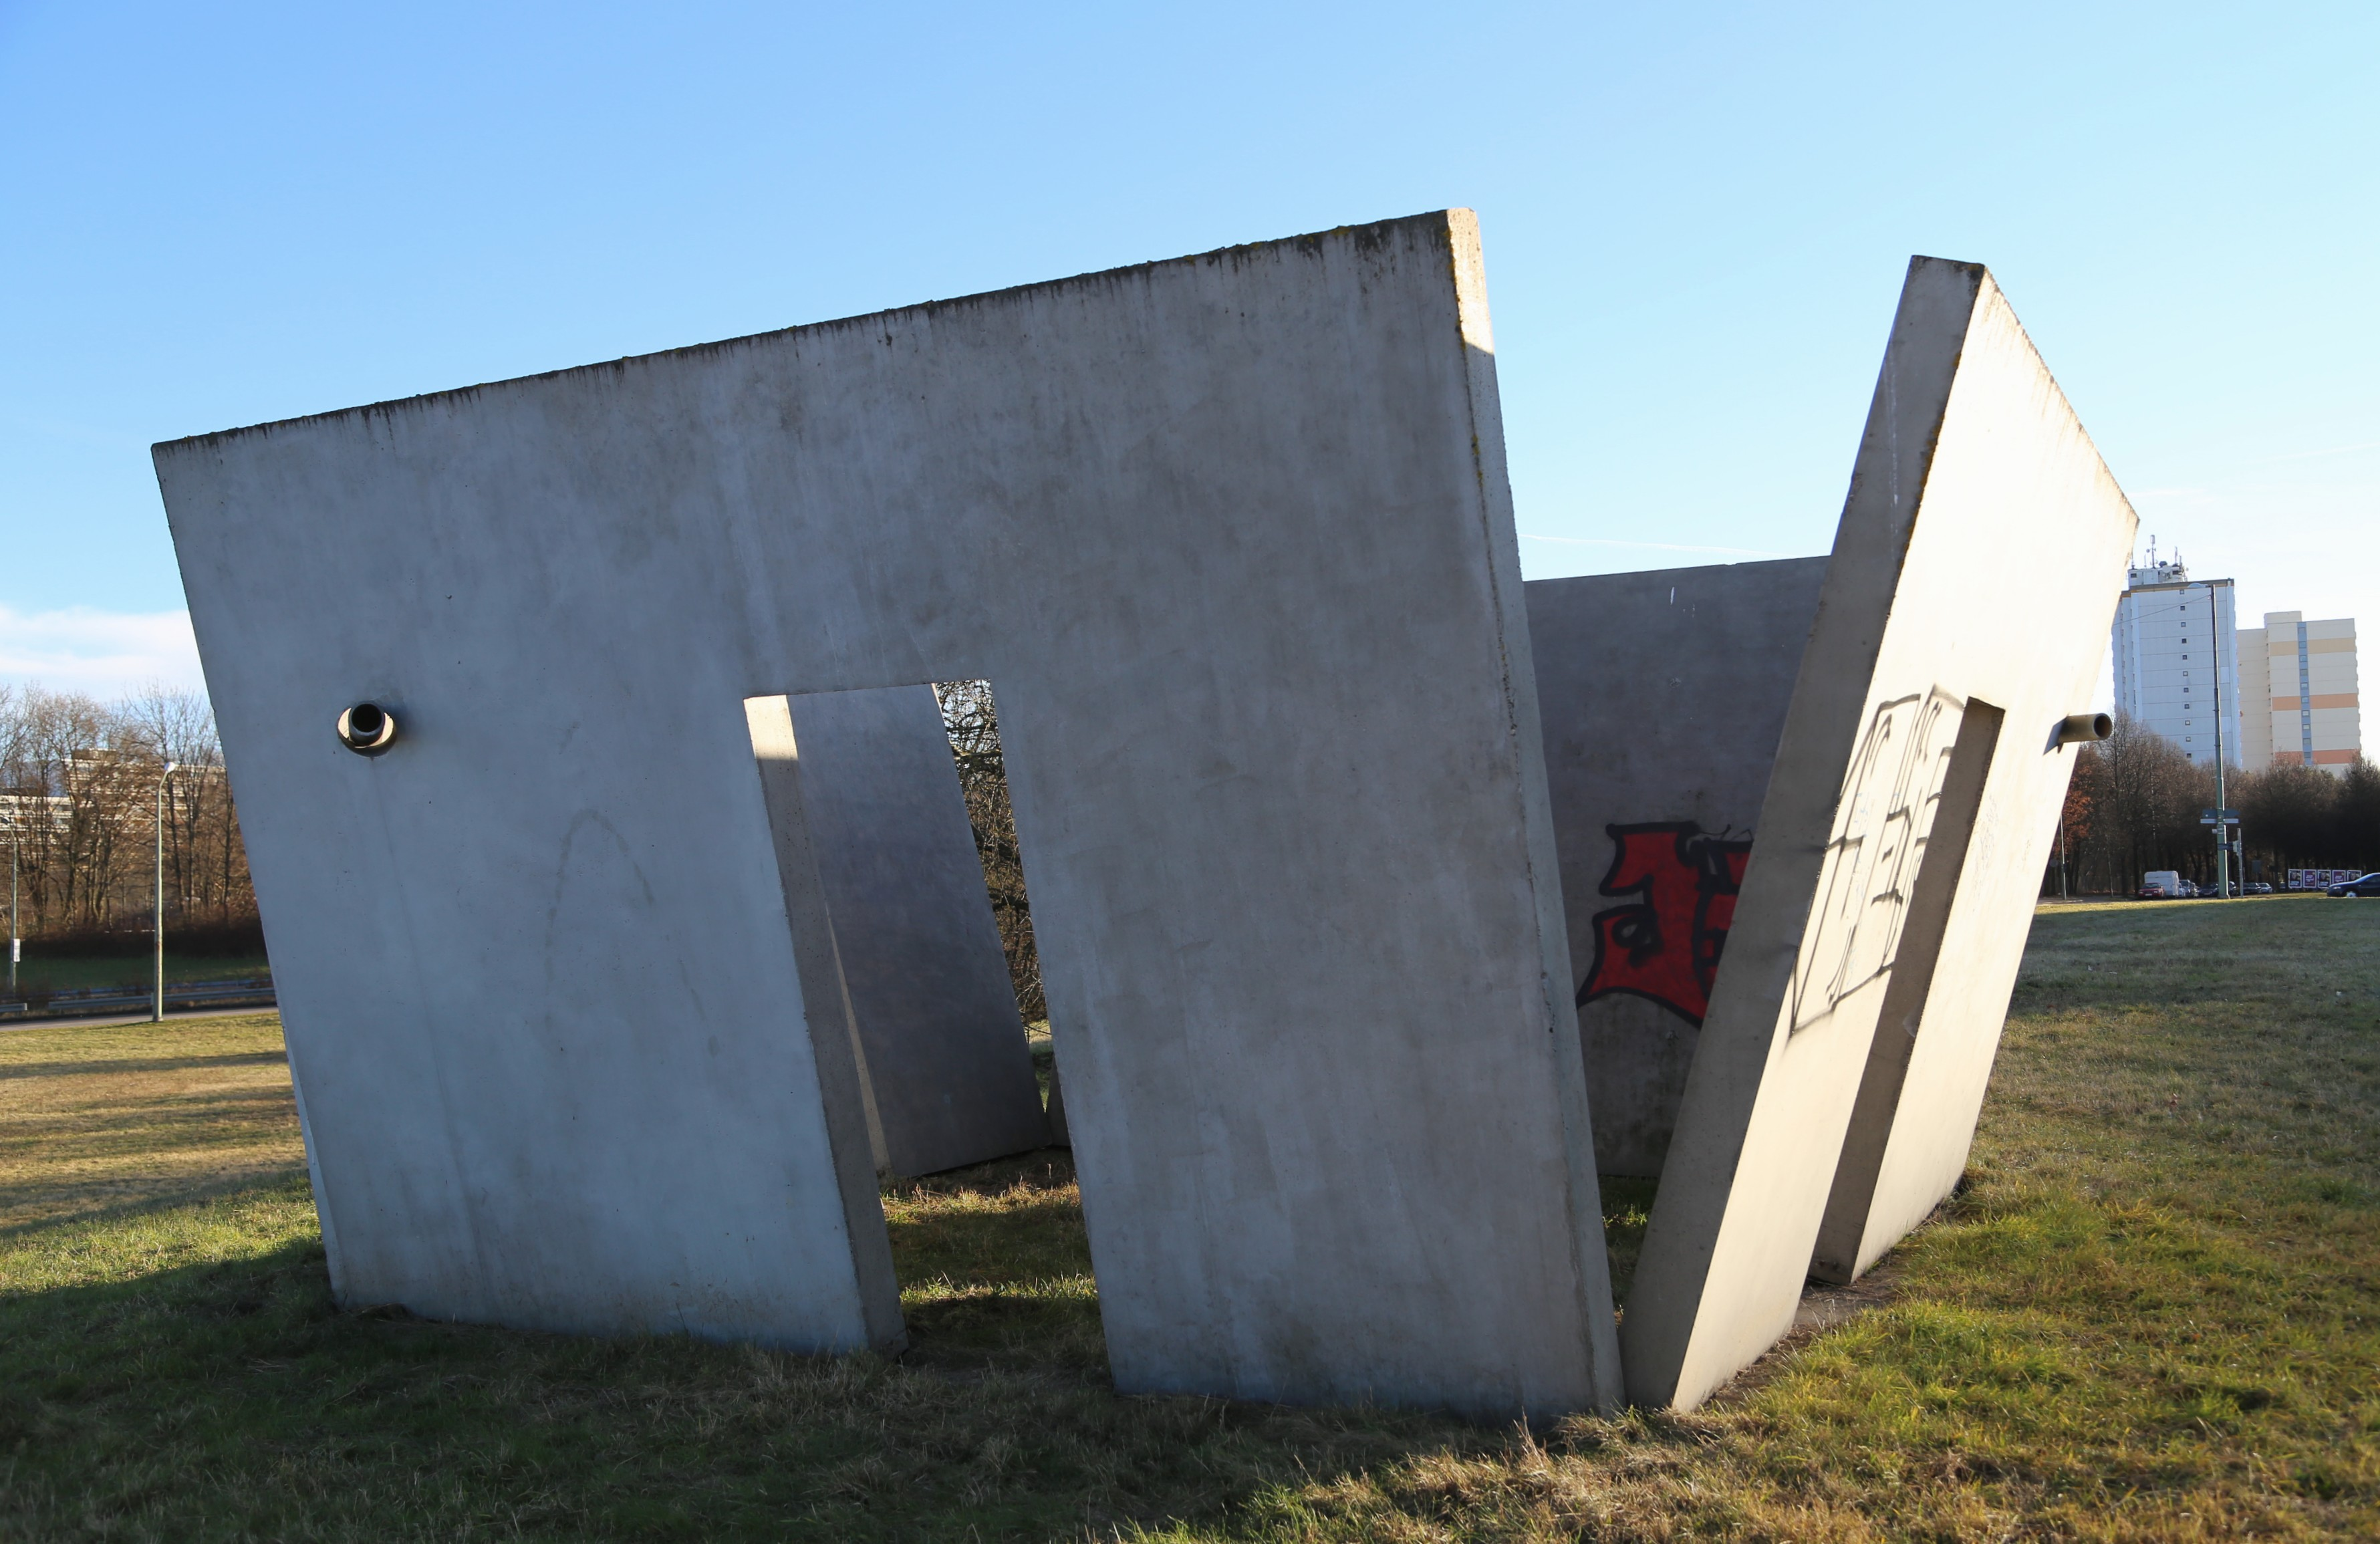 Schräge Wände file winkler pavillon schraege waende 2003 staendlerstraße